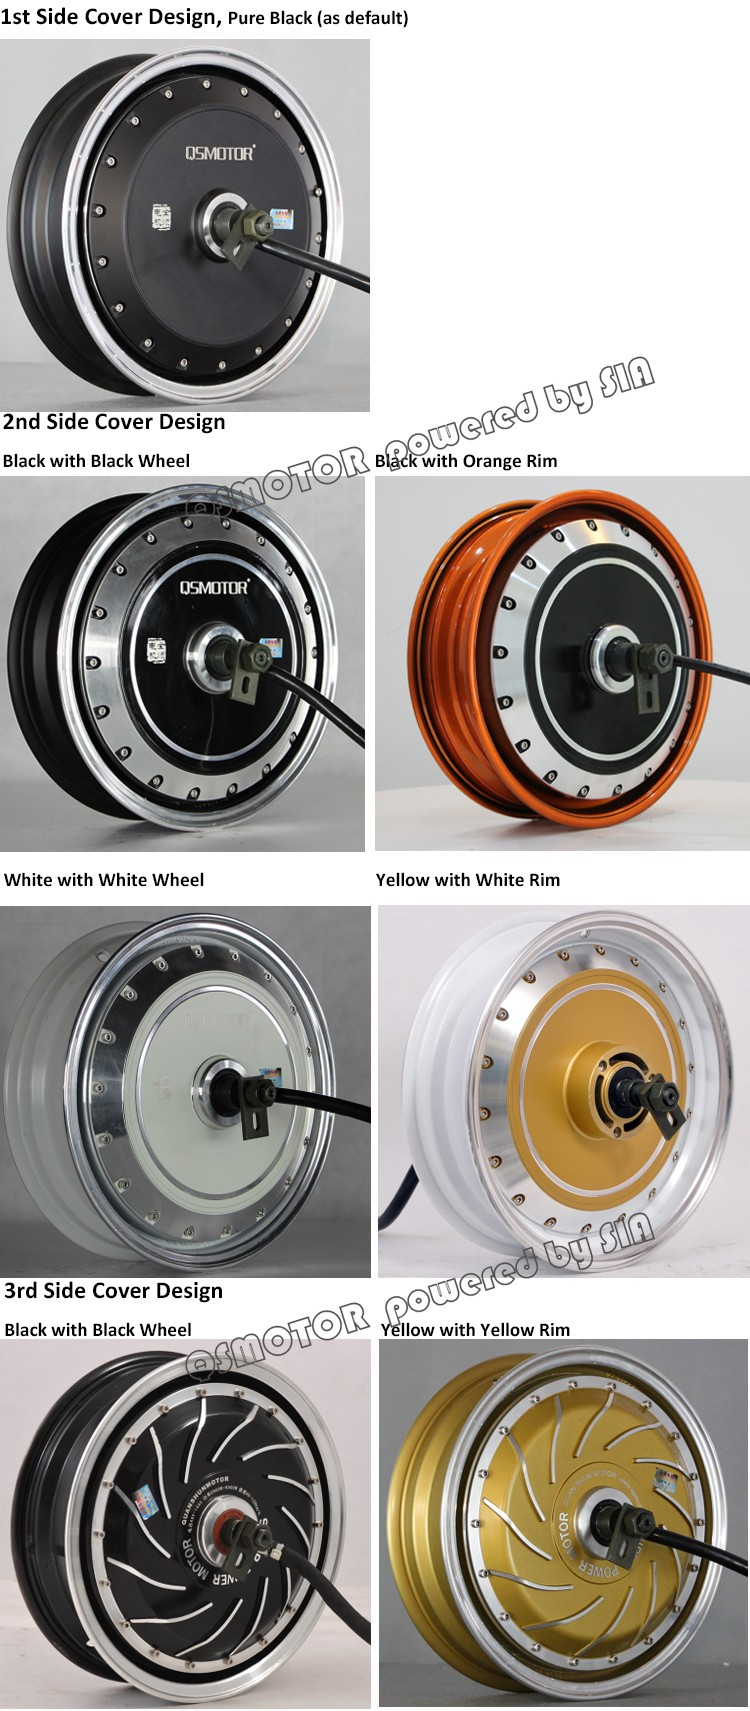 13inch Hub Motor Optional Appearance